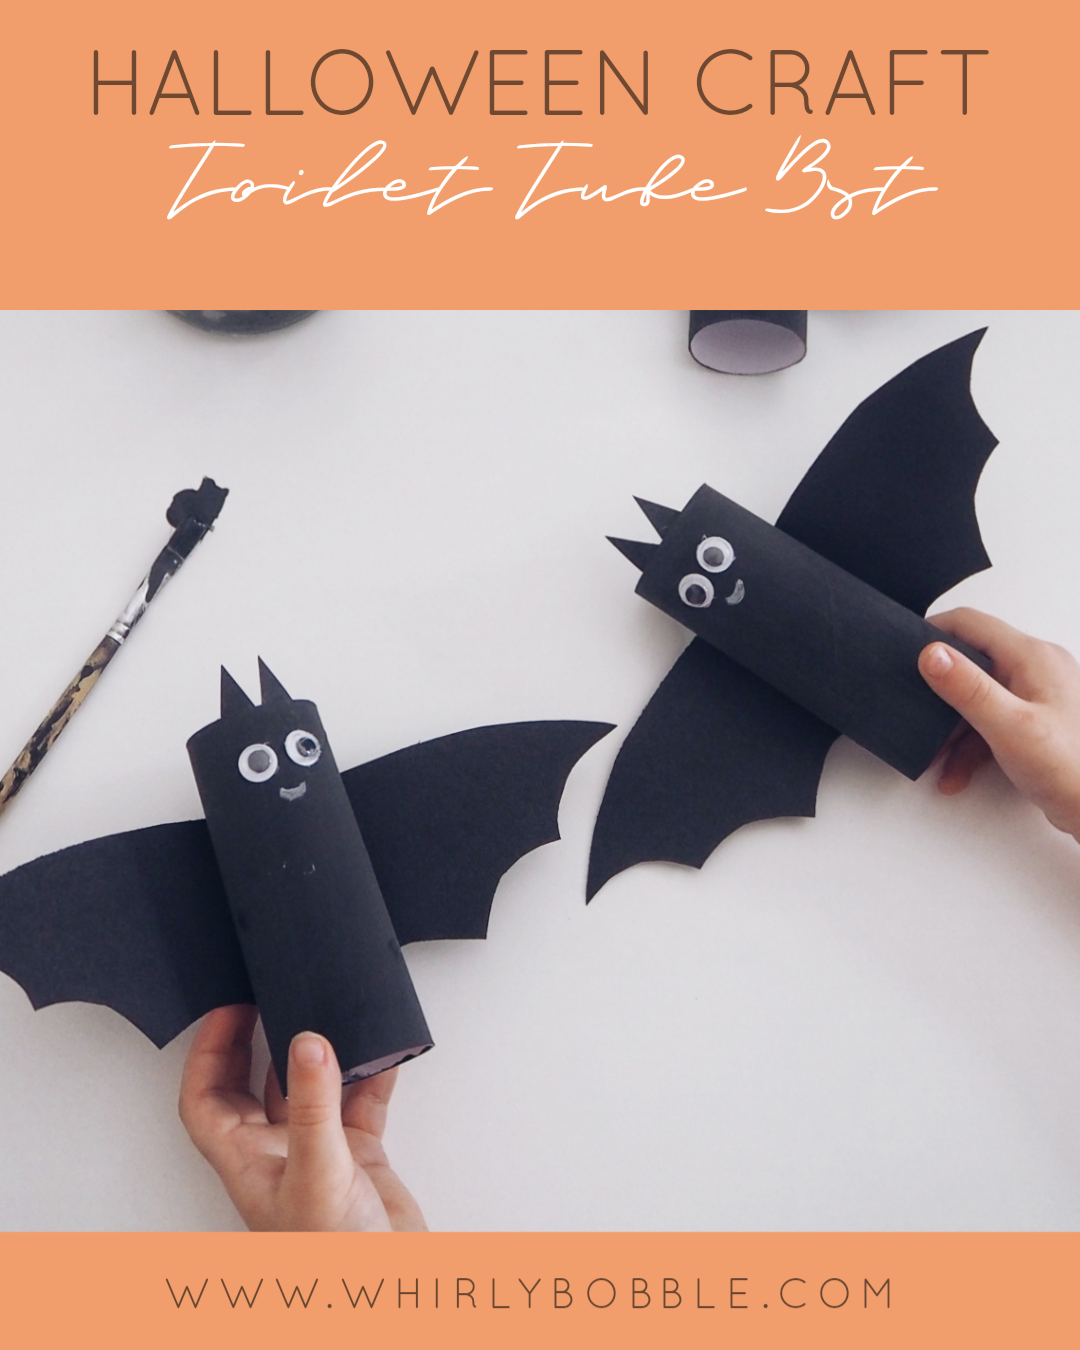 Halloween craft toilet tube bats